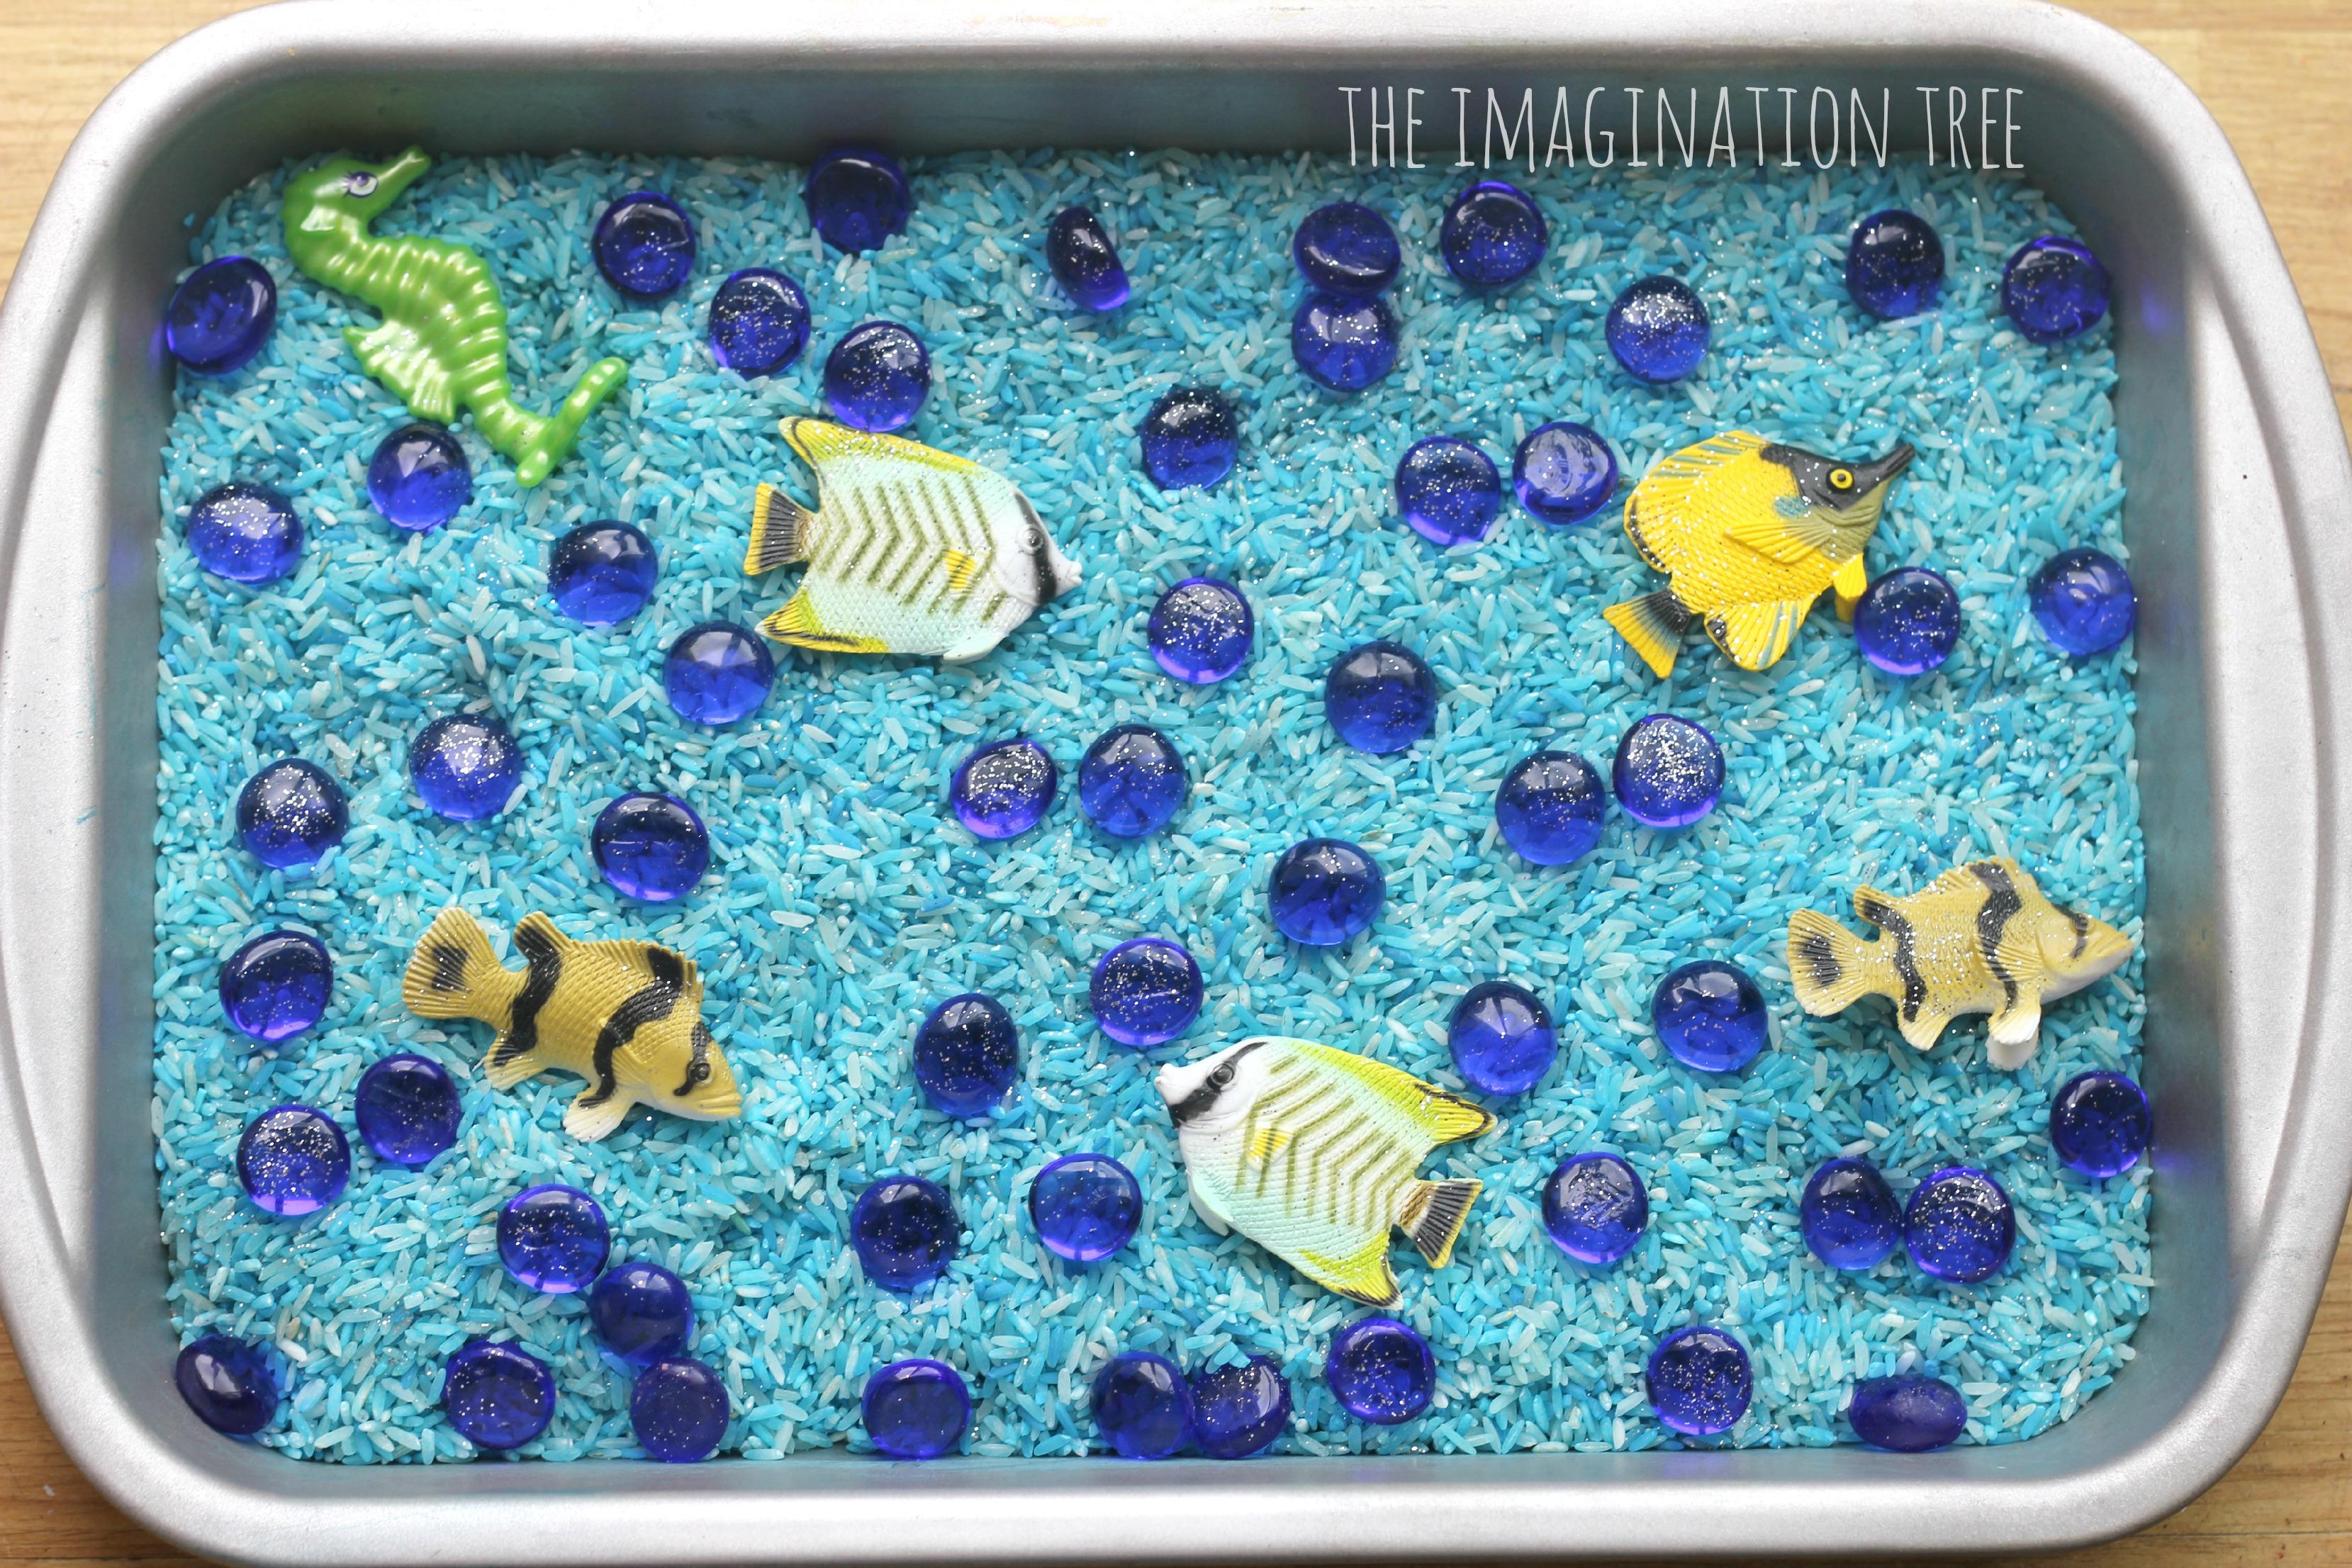 Ocean Sensory Tray With Frozen Rice The Imagination Tree